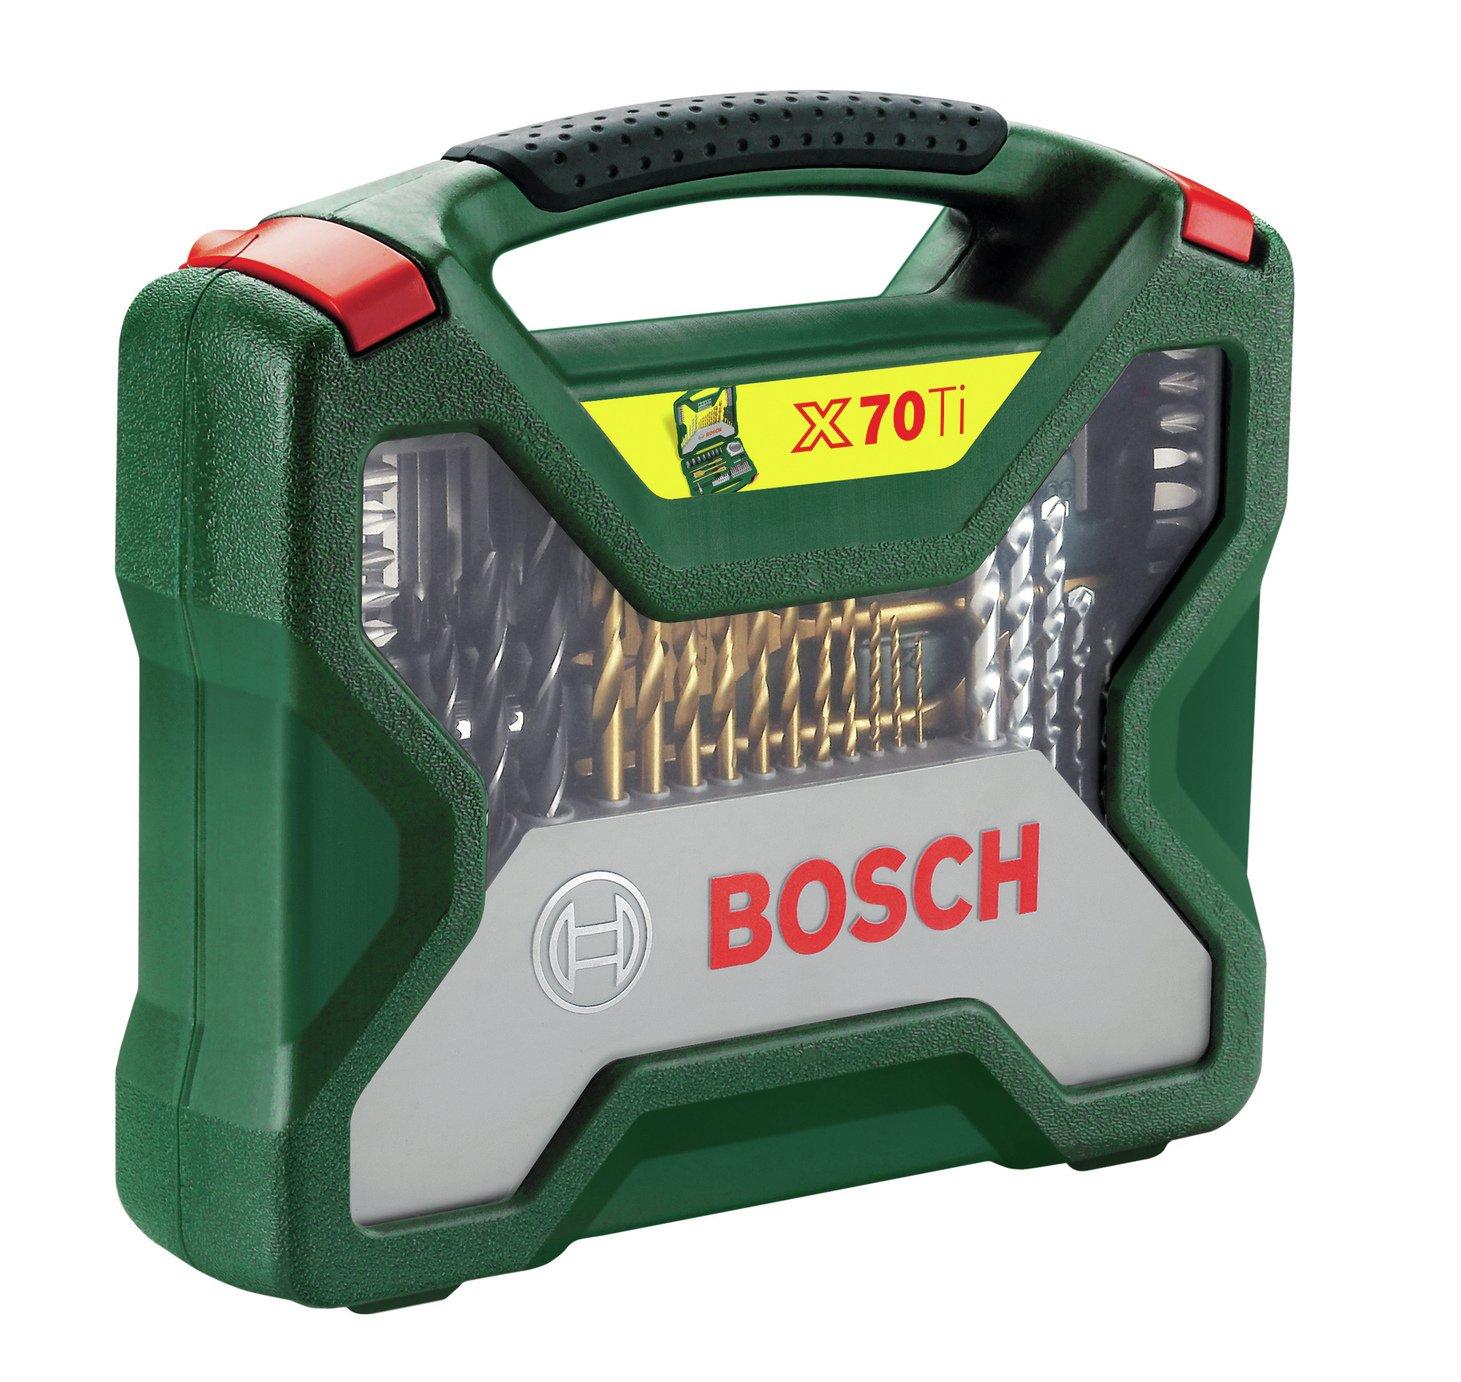 Bosch 70 Piece X-Line Drill Bit Set